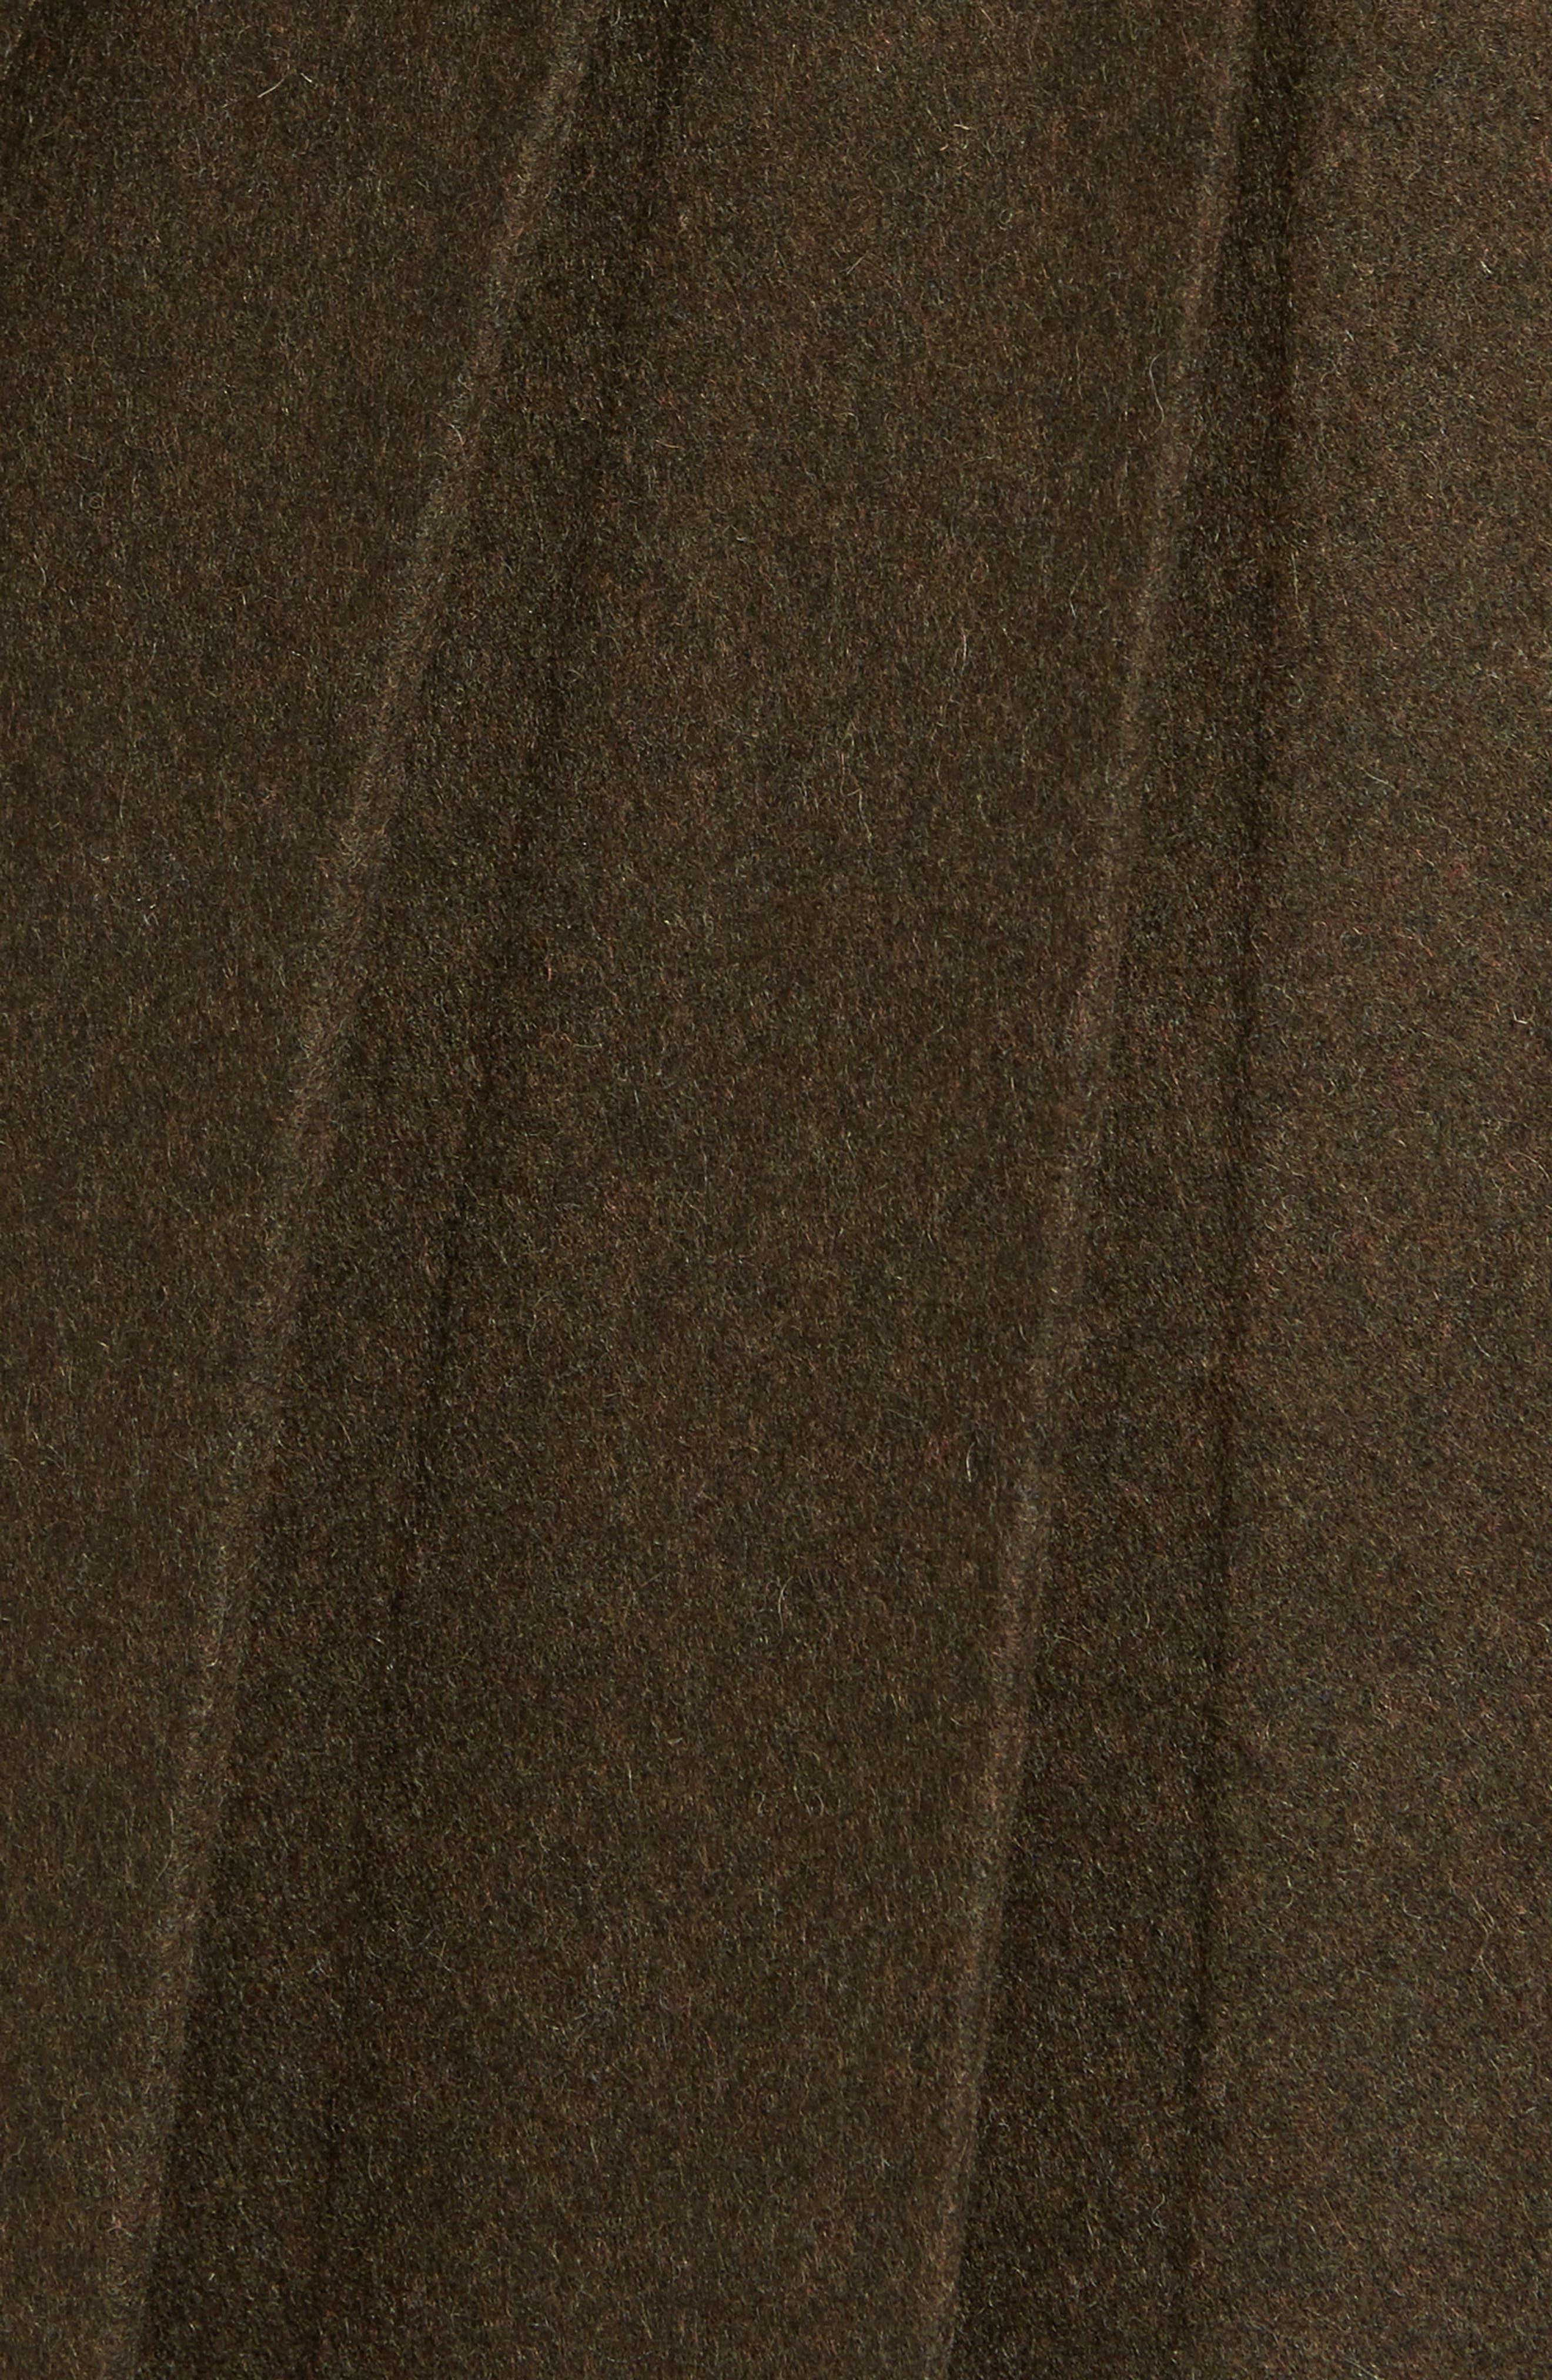 Wool Blend Skirted Military Coat,                             Alternate thumbnail 5, color,                             Olive